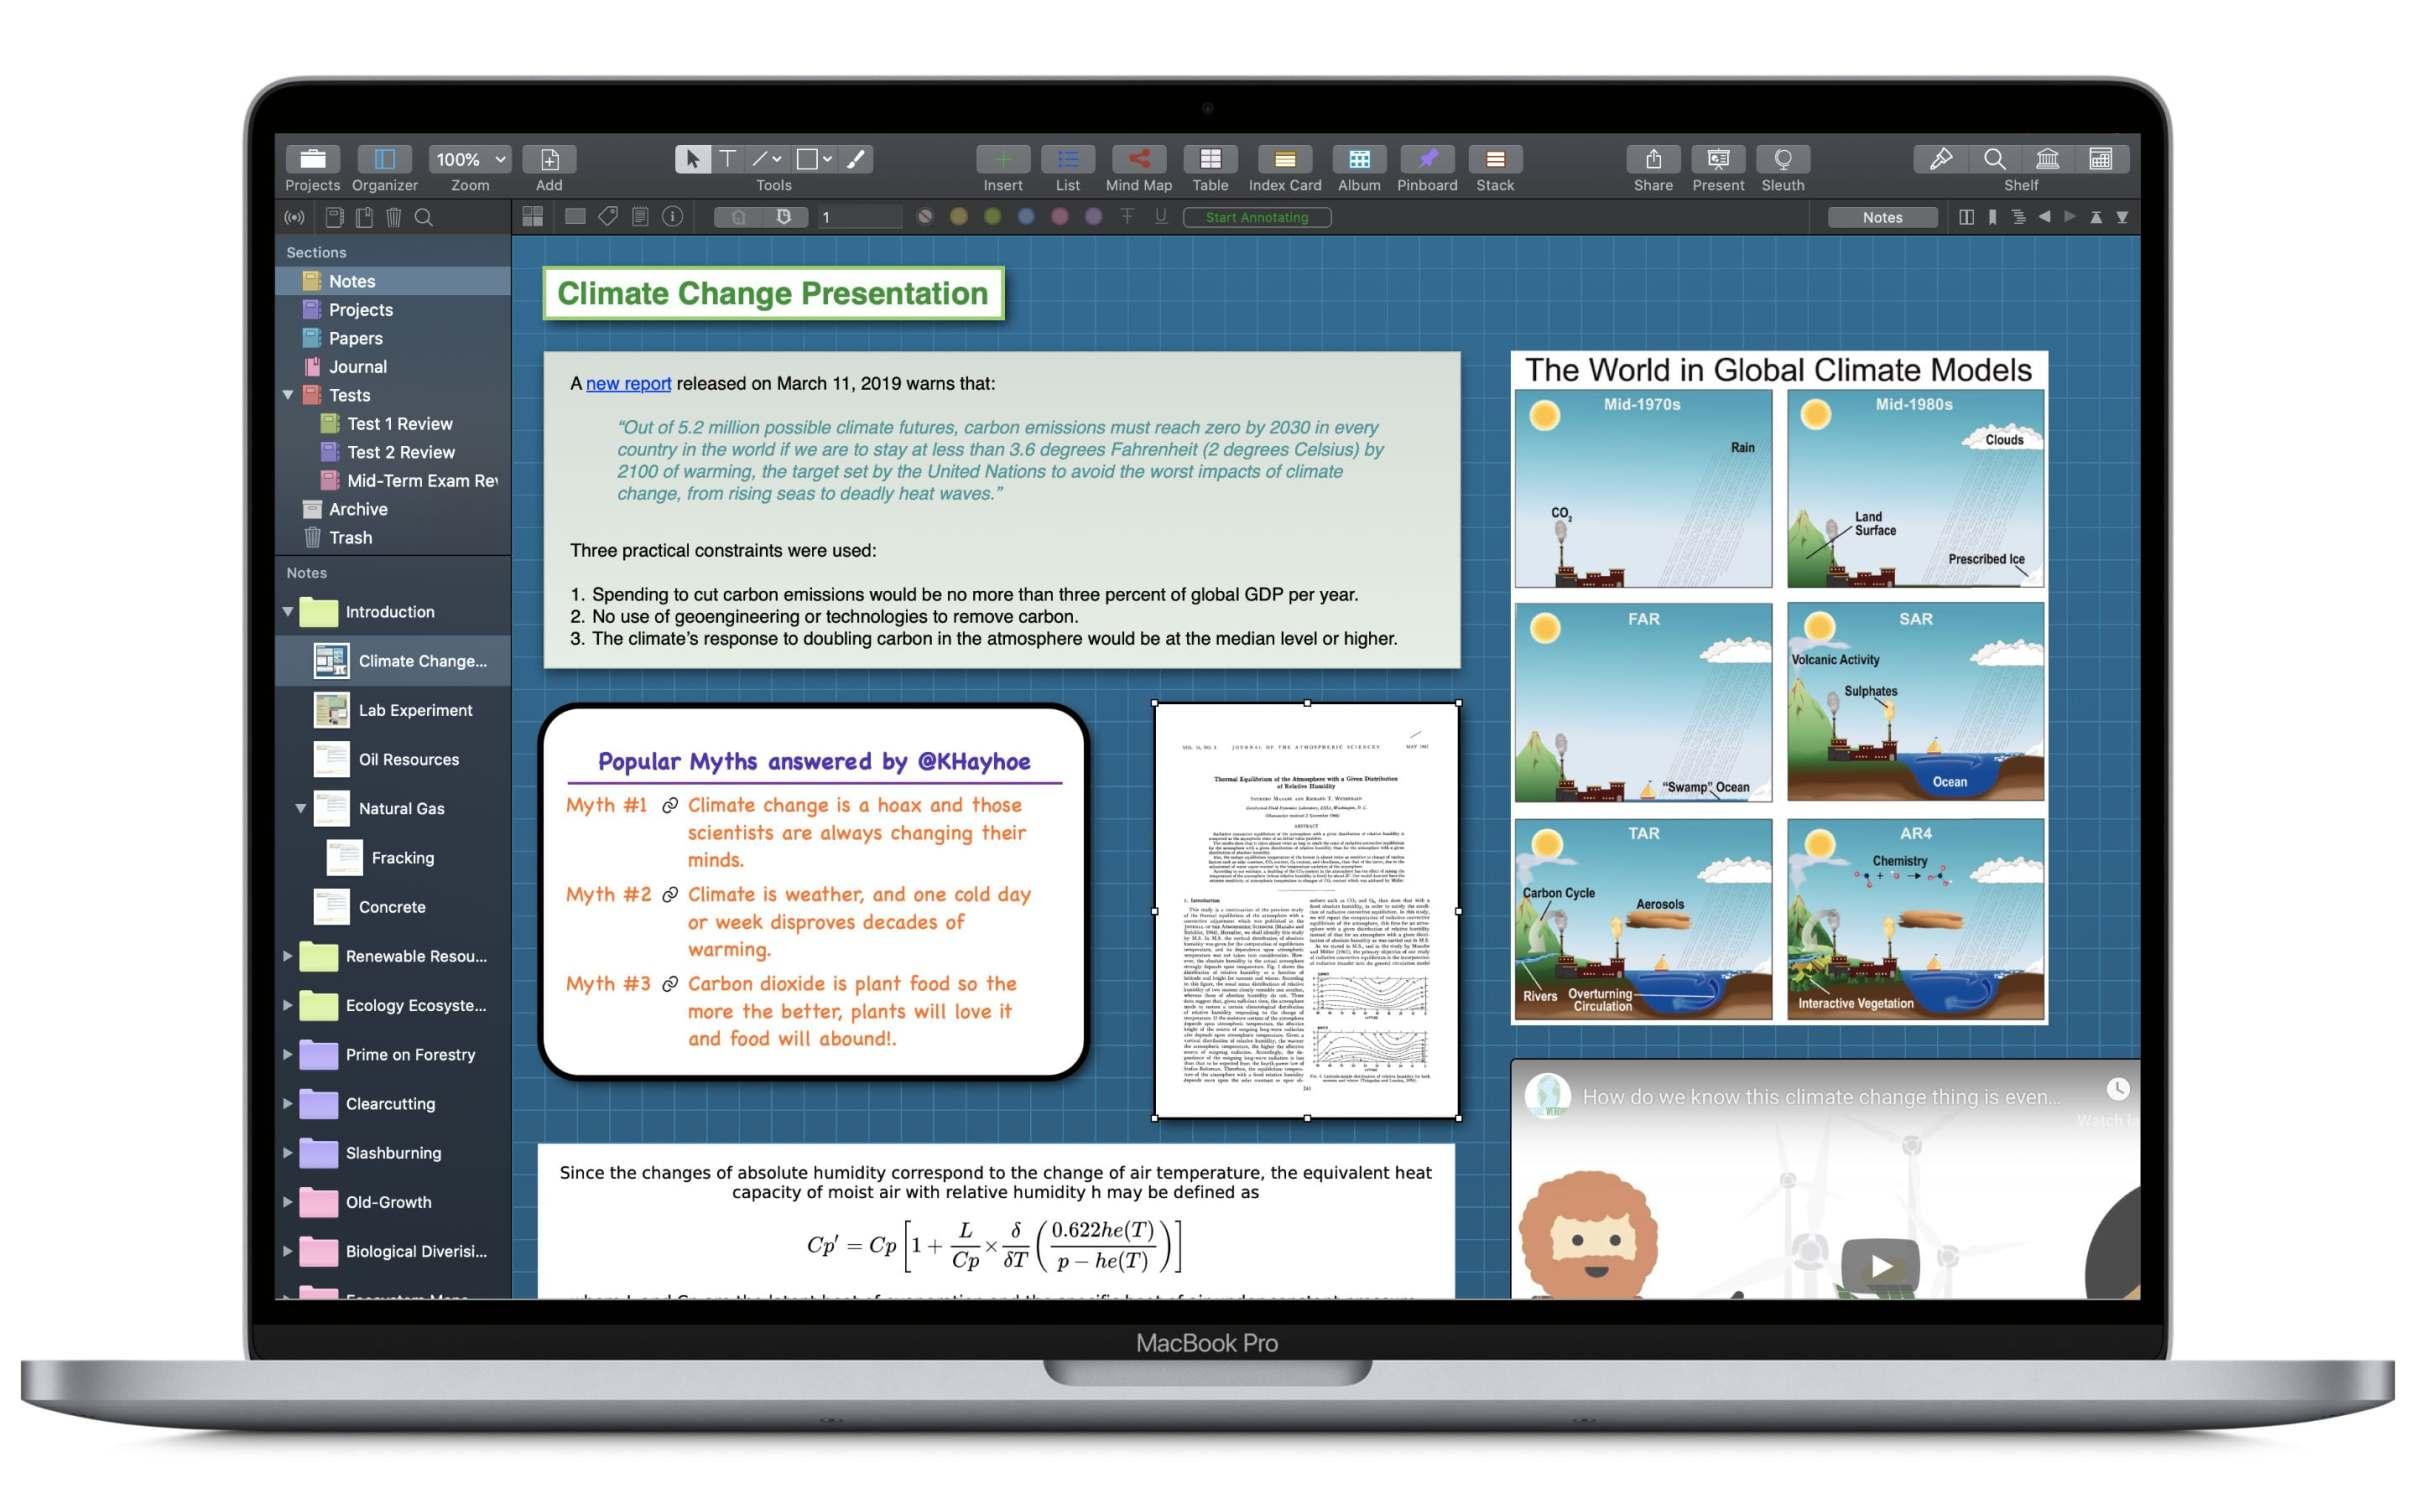 Curio Professional for Mac 12 破解版 - 直观的笔记和思维导图应用